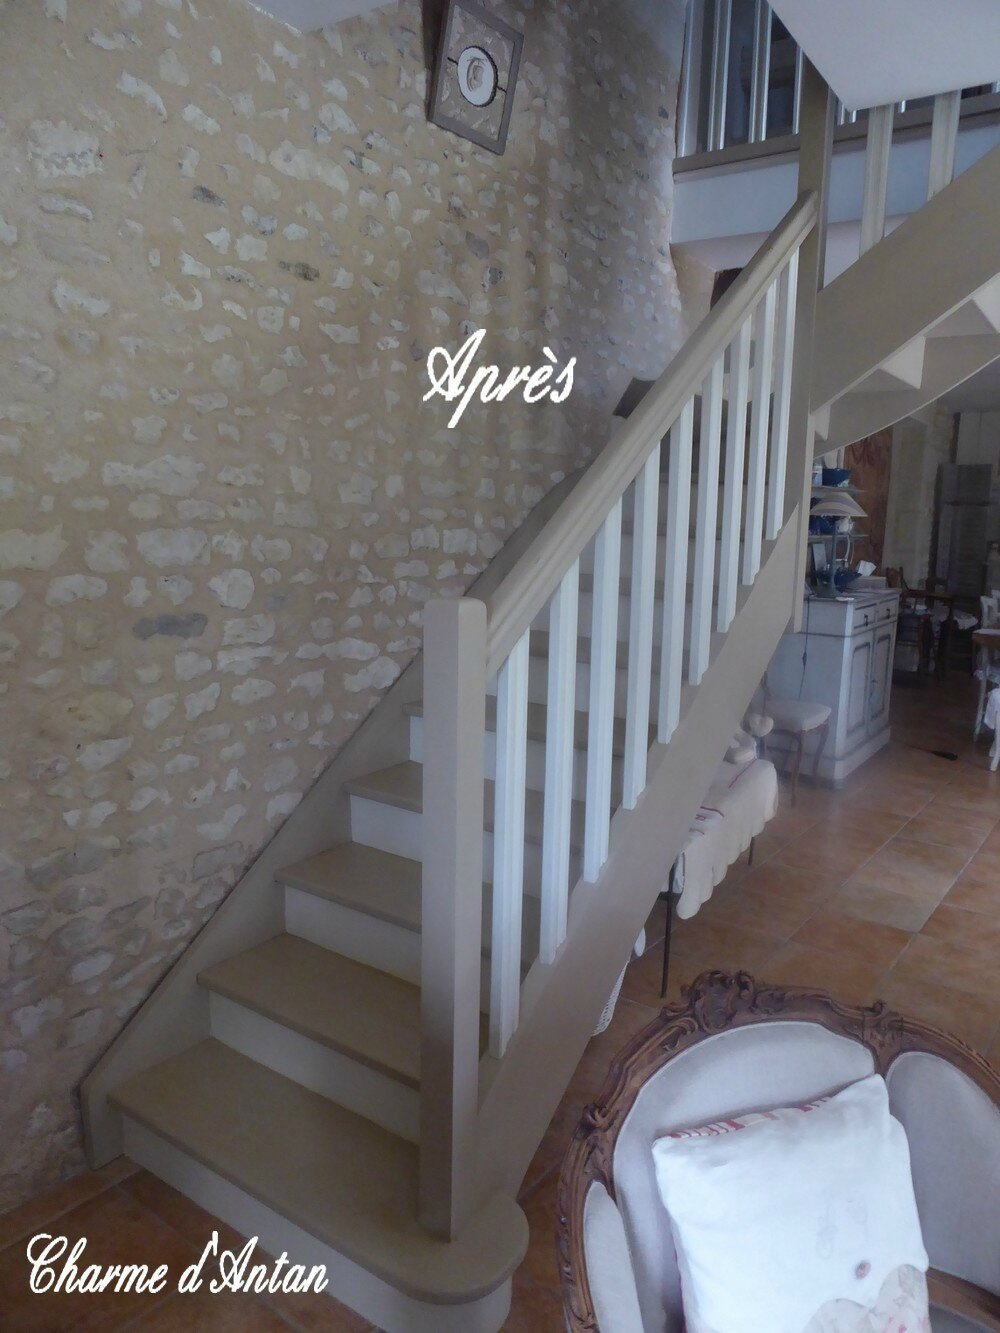 Mon Escalier Repeint Charme D Antan